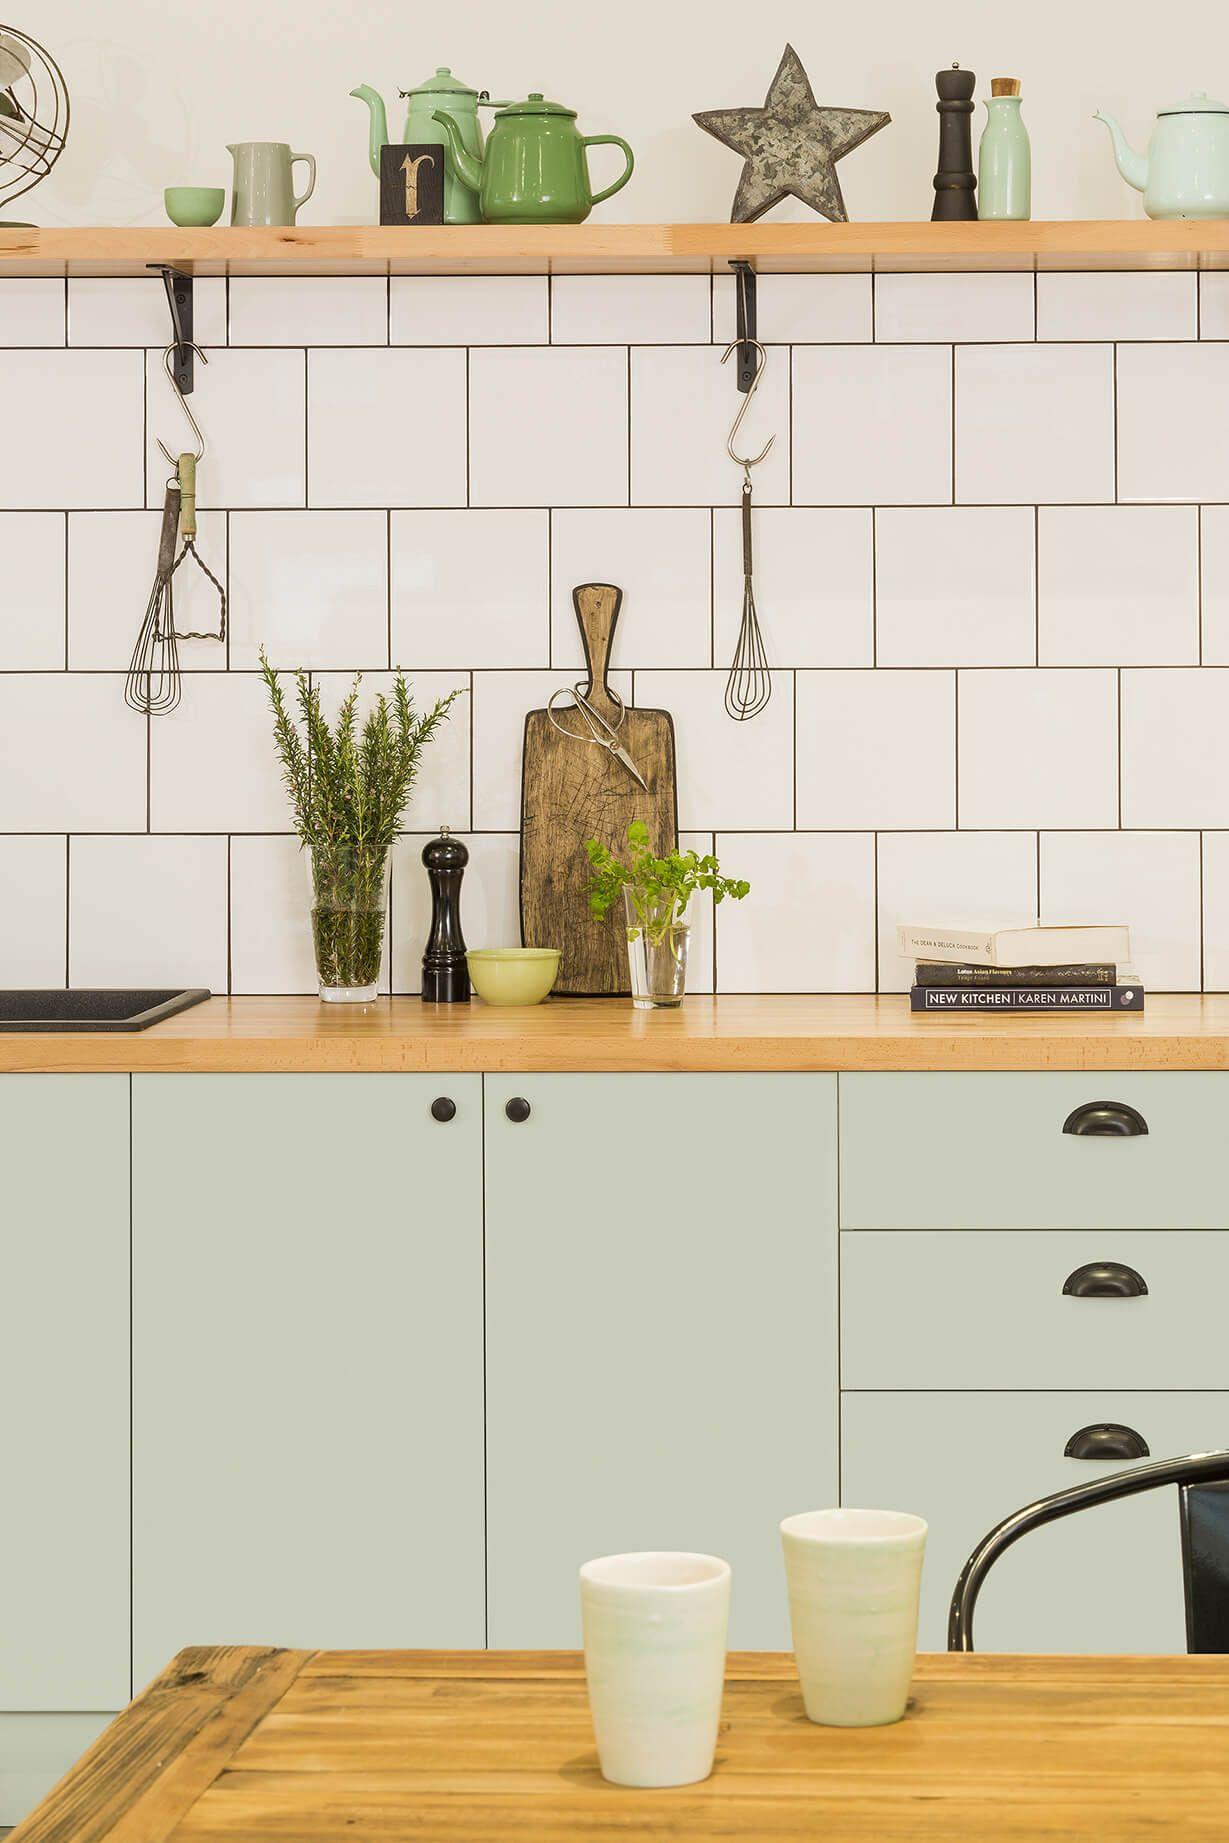 retro style kaboodle kitchen kitchen redo kaboodle kitchen bunnings kitchen on kaboodle kitchen bunnings drawers id=35085